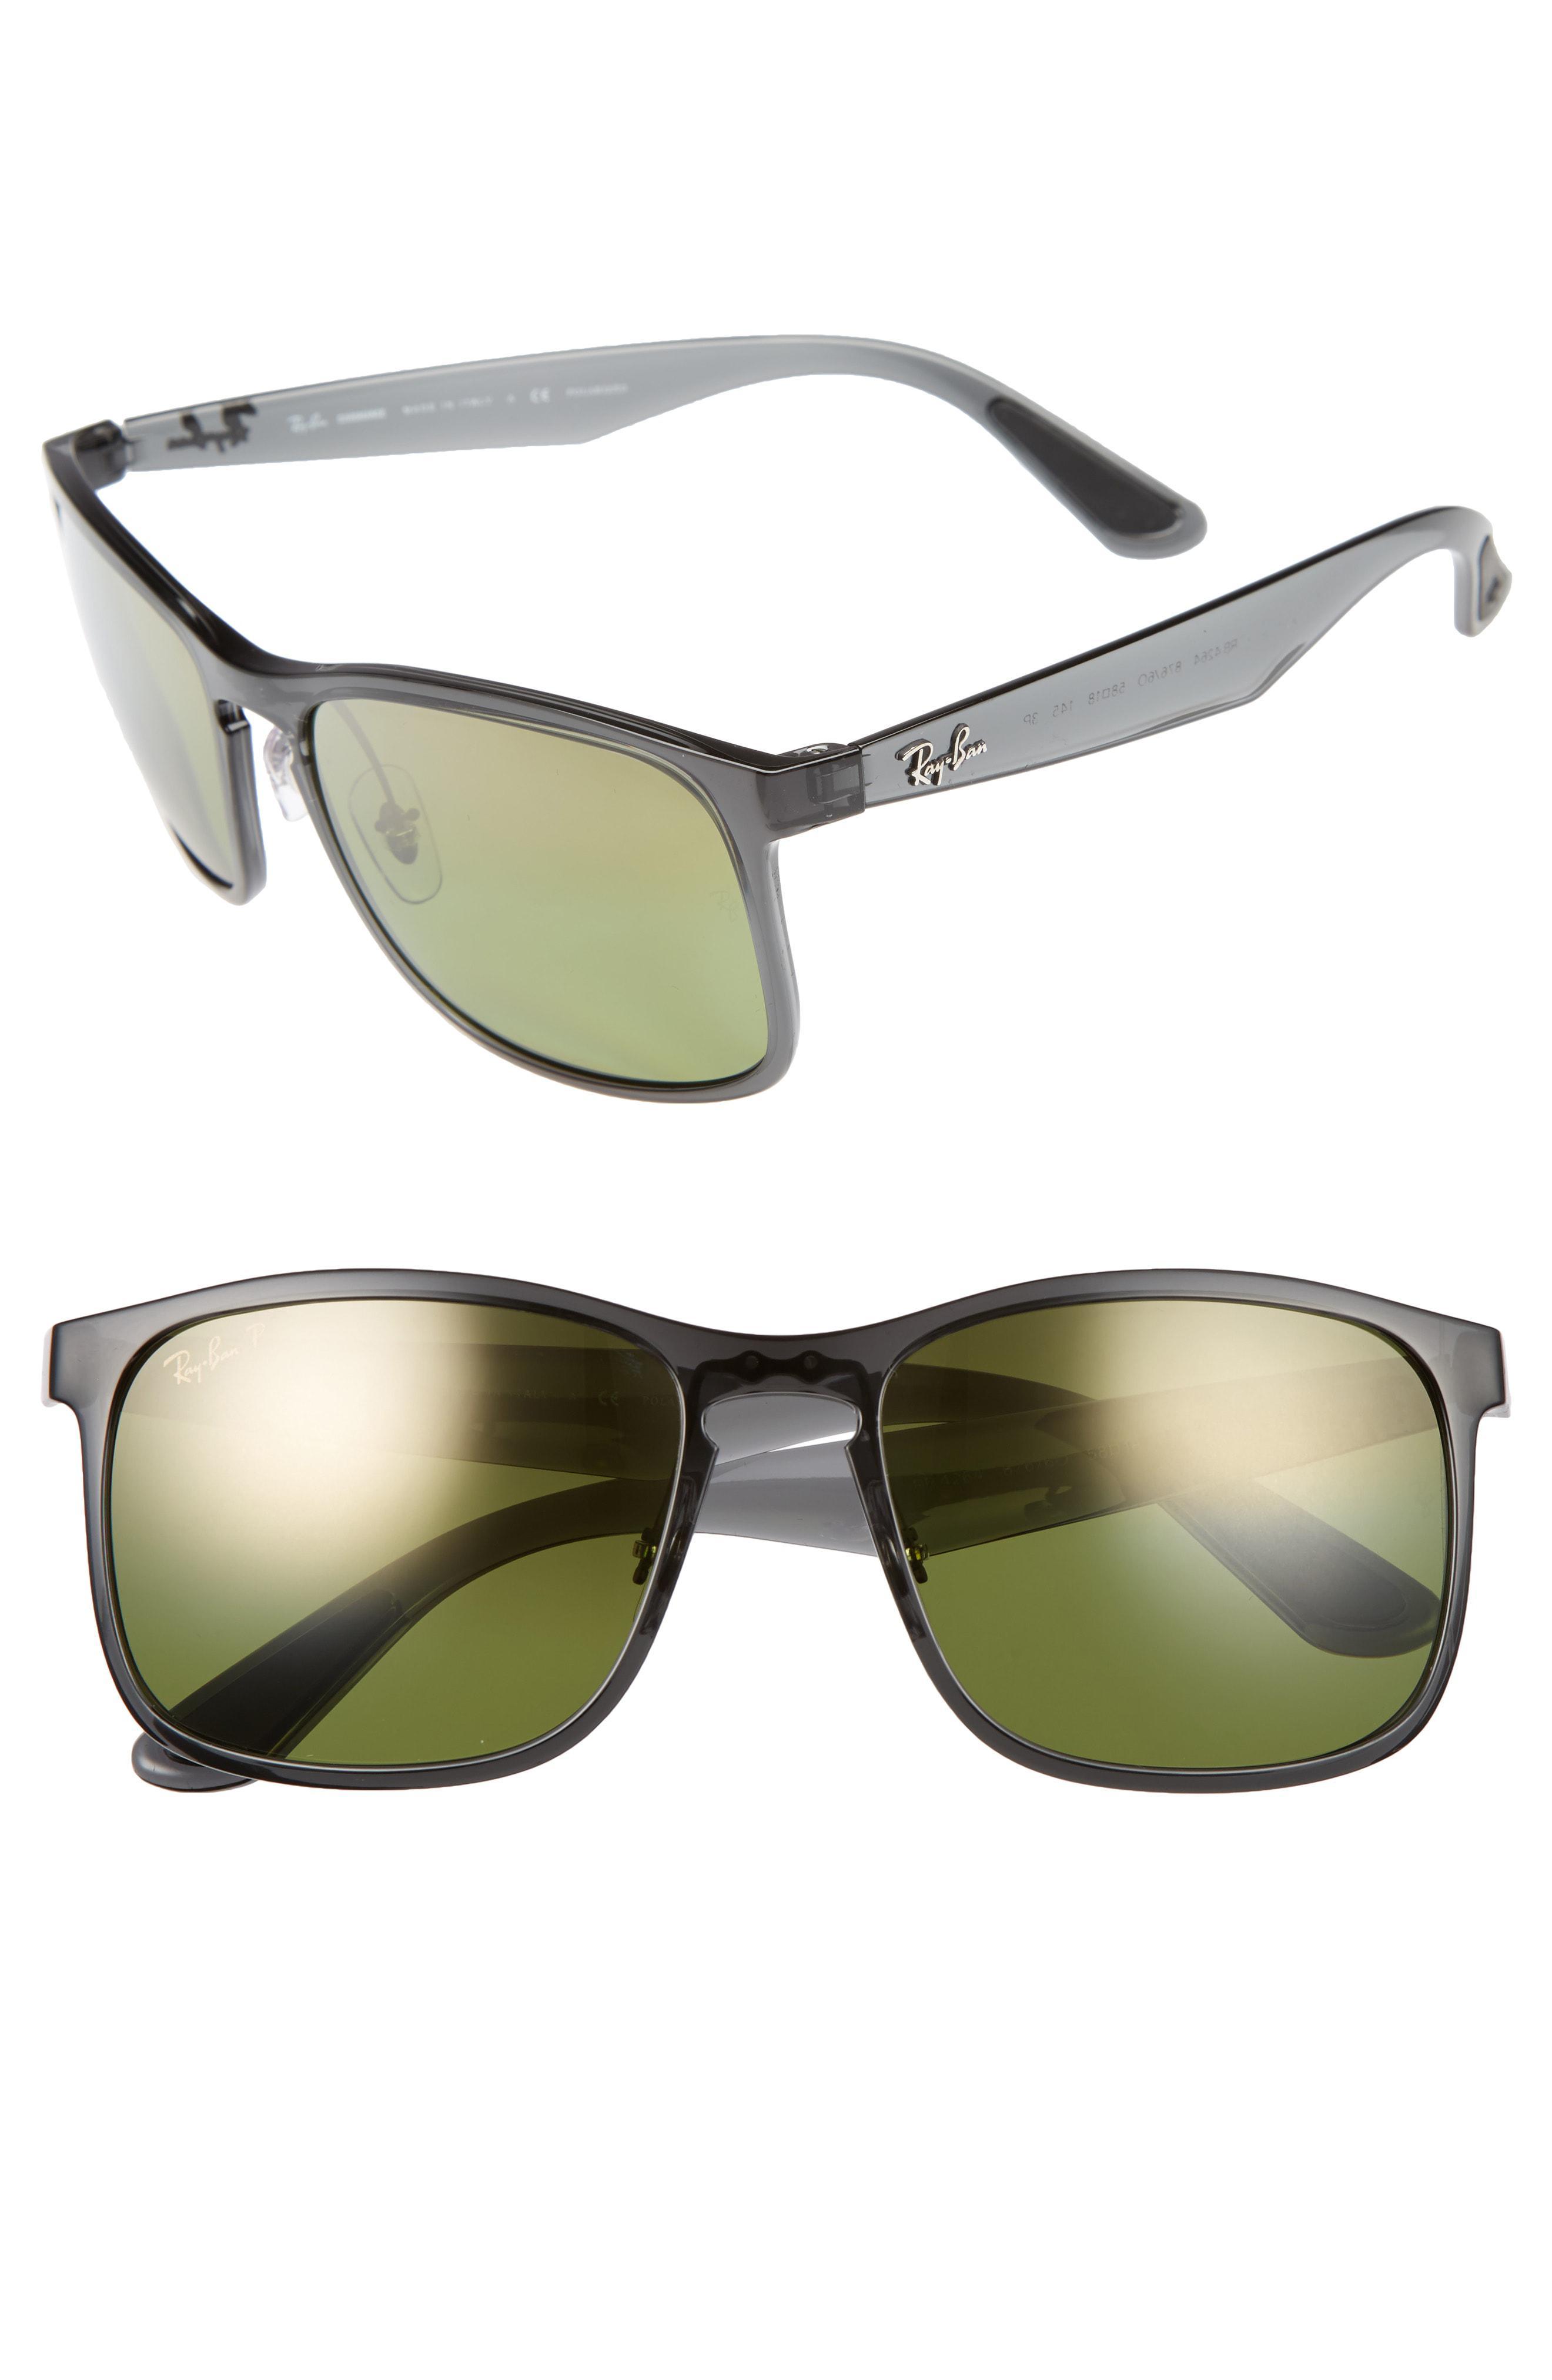 09a216506ea Ray-Ban 58mm Chromance Sunglasses - Shiny Grey green Mirror Gold in ...